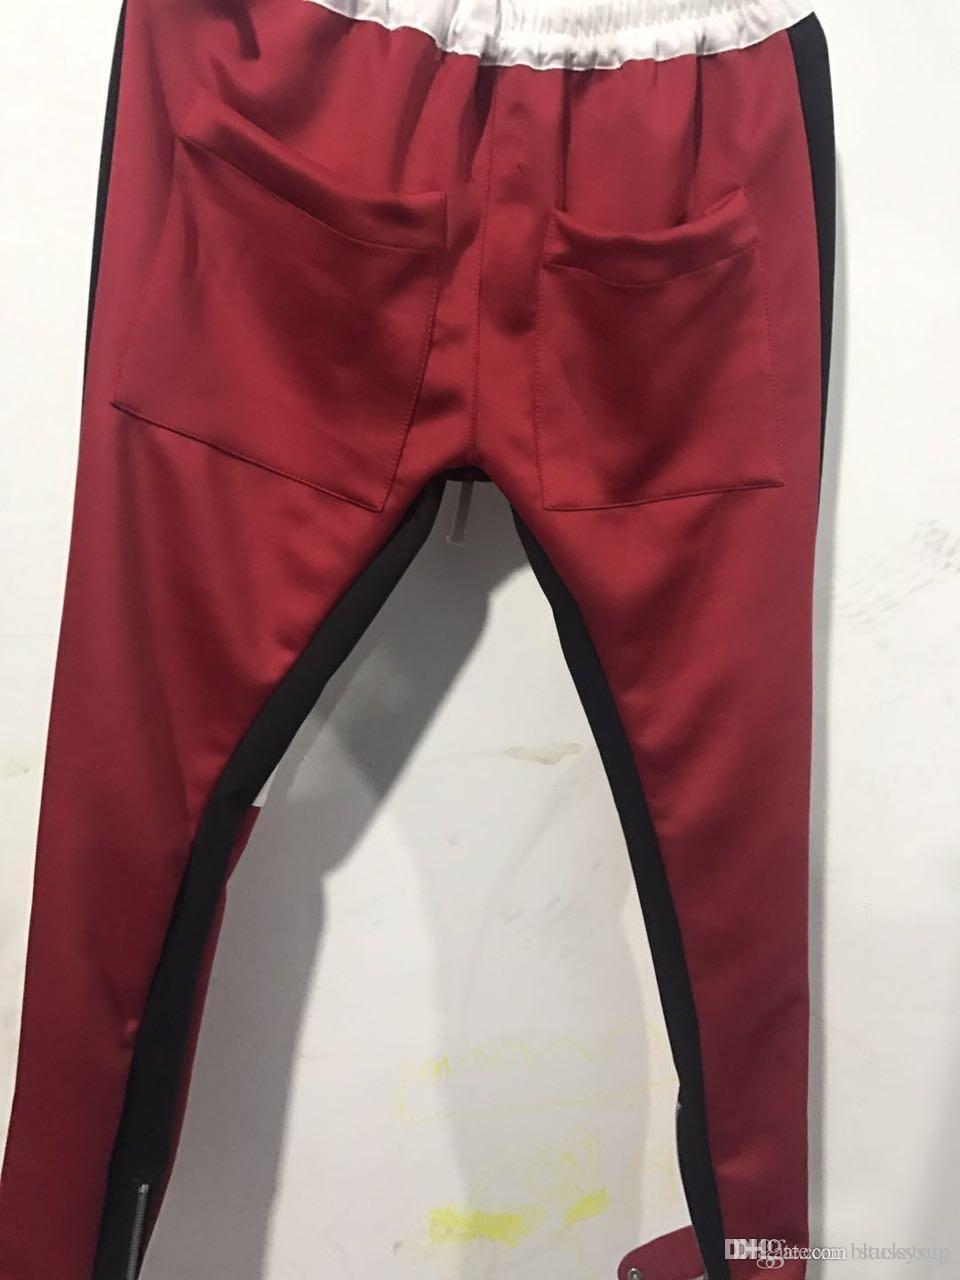 c8dfdf0fd6c9e New Zipper Pants Hip hop Fashion Jogger Urban Clothing Red Bottoms kanye  FOG jogger justin Bieber Pants Free Shipping